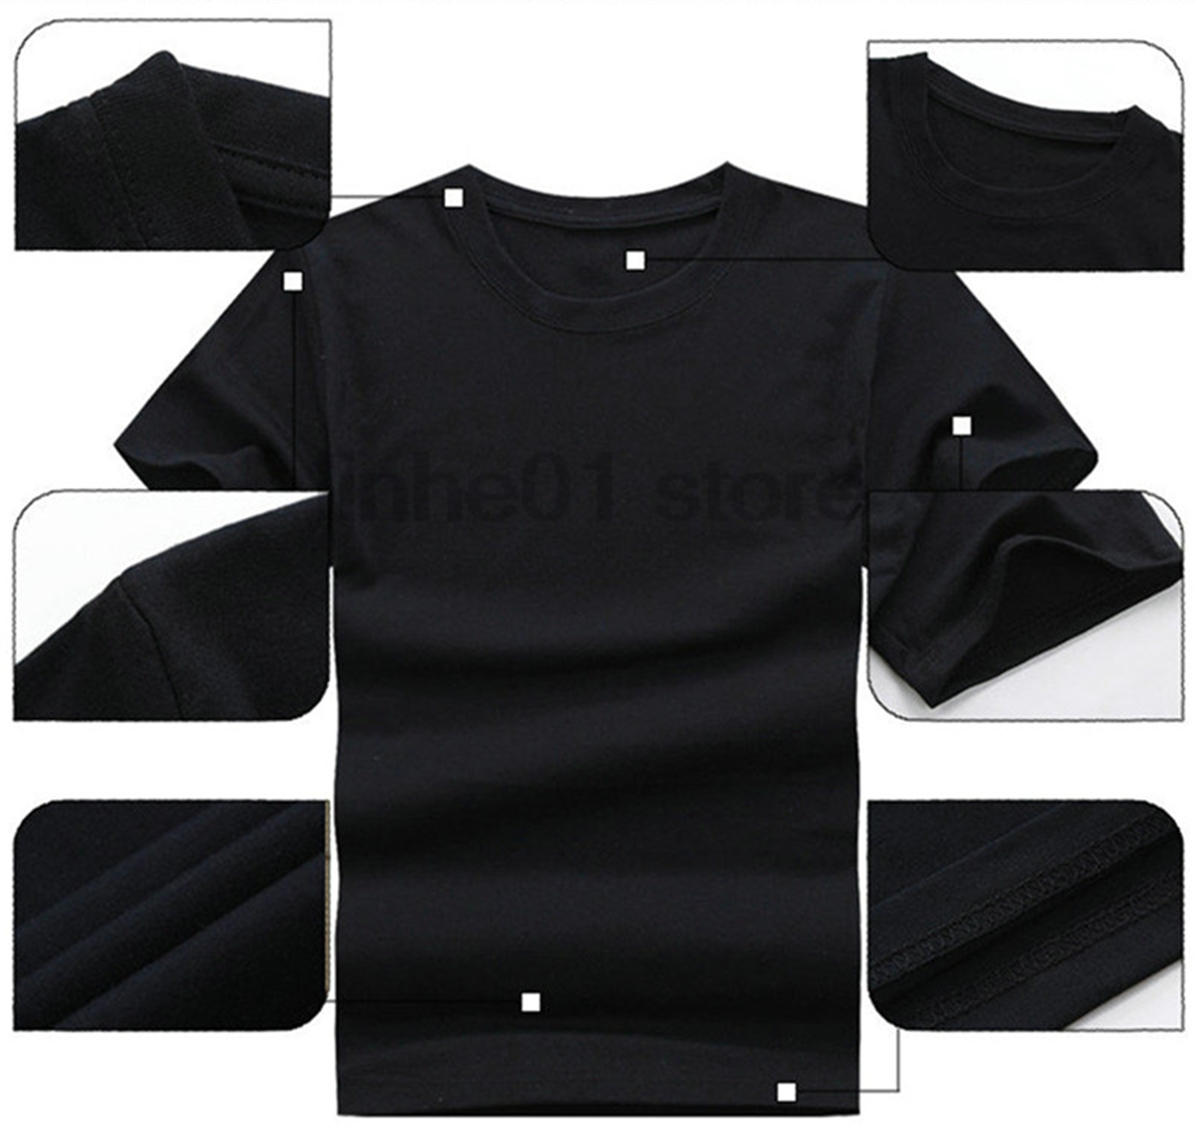 GILDAN BOSTON - MASSACHUSETTS United States USA relaxed fit T-Shirt Hot Womens T-shirt